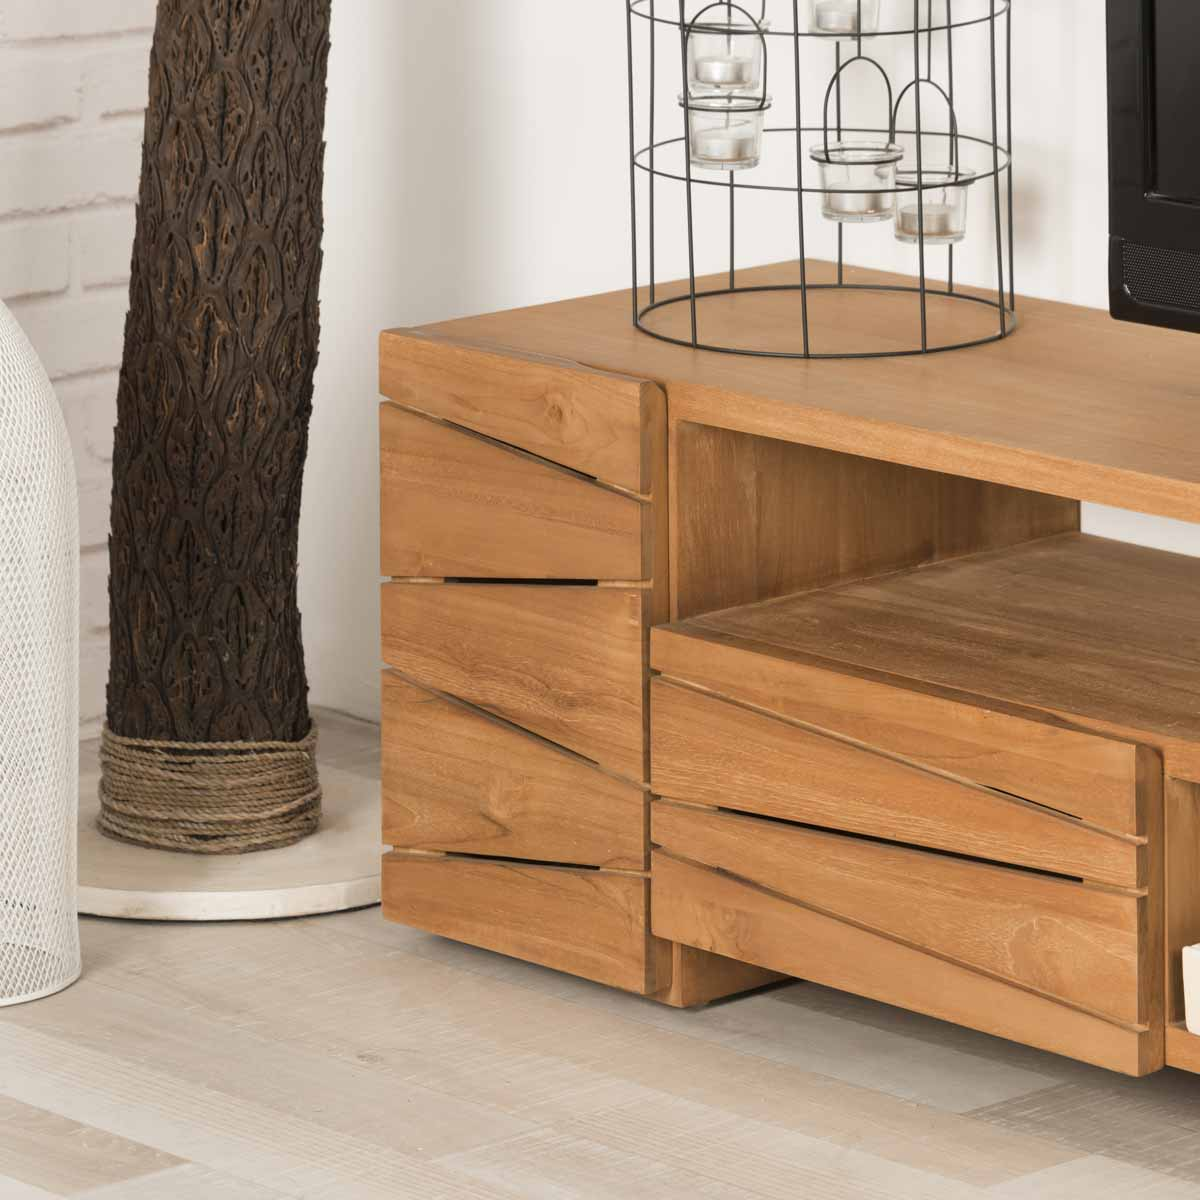 Meuble tv teck meuble tv bois naturel rectangle